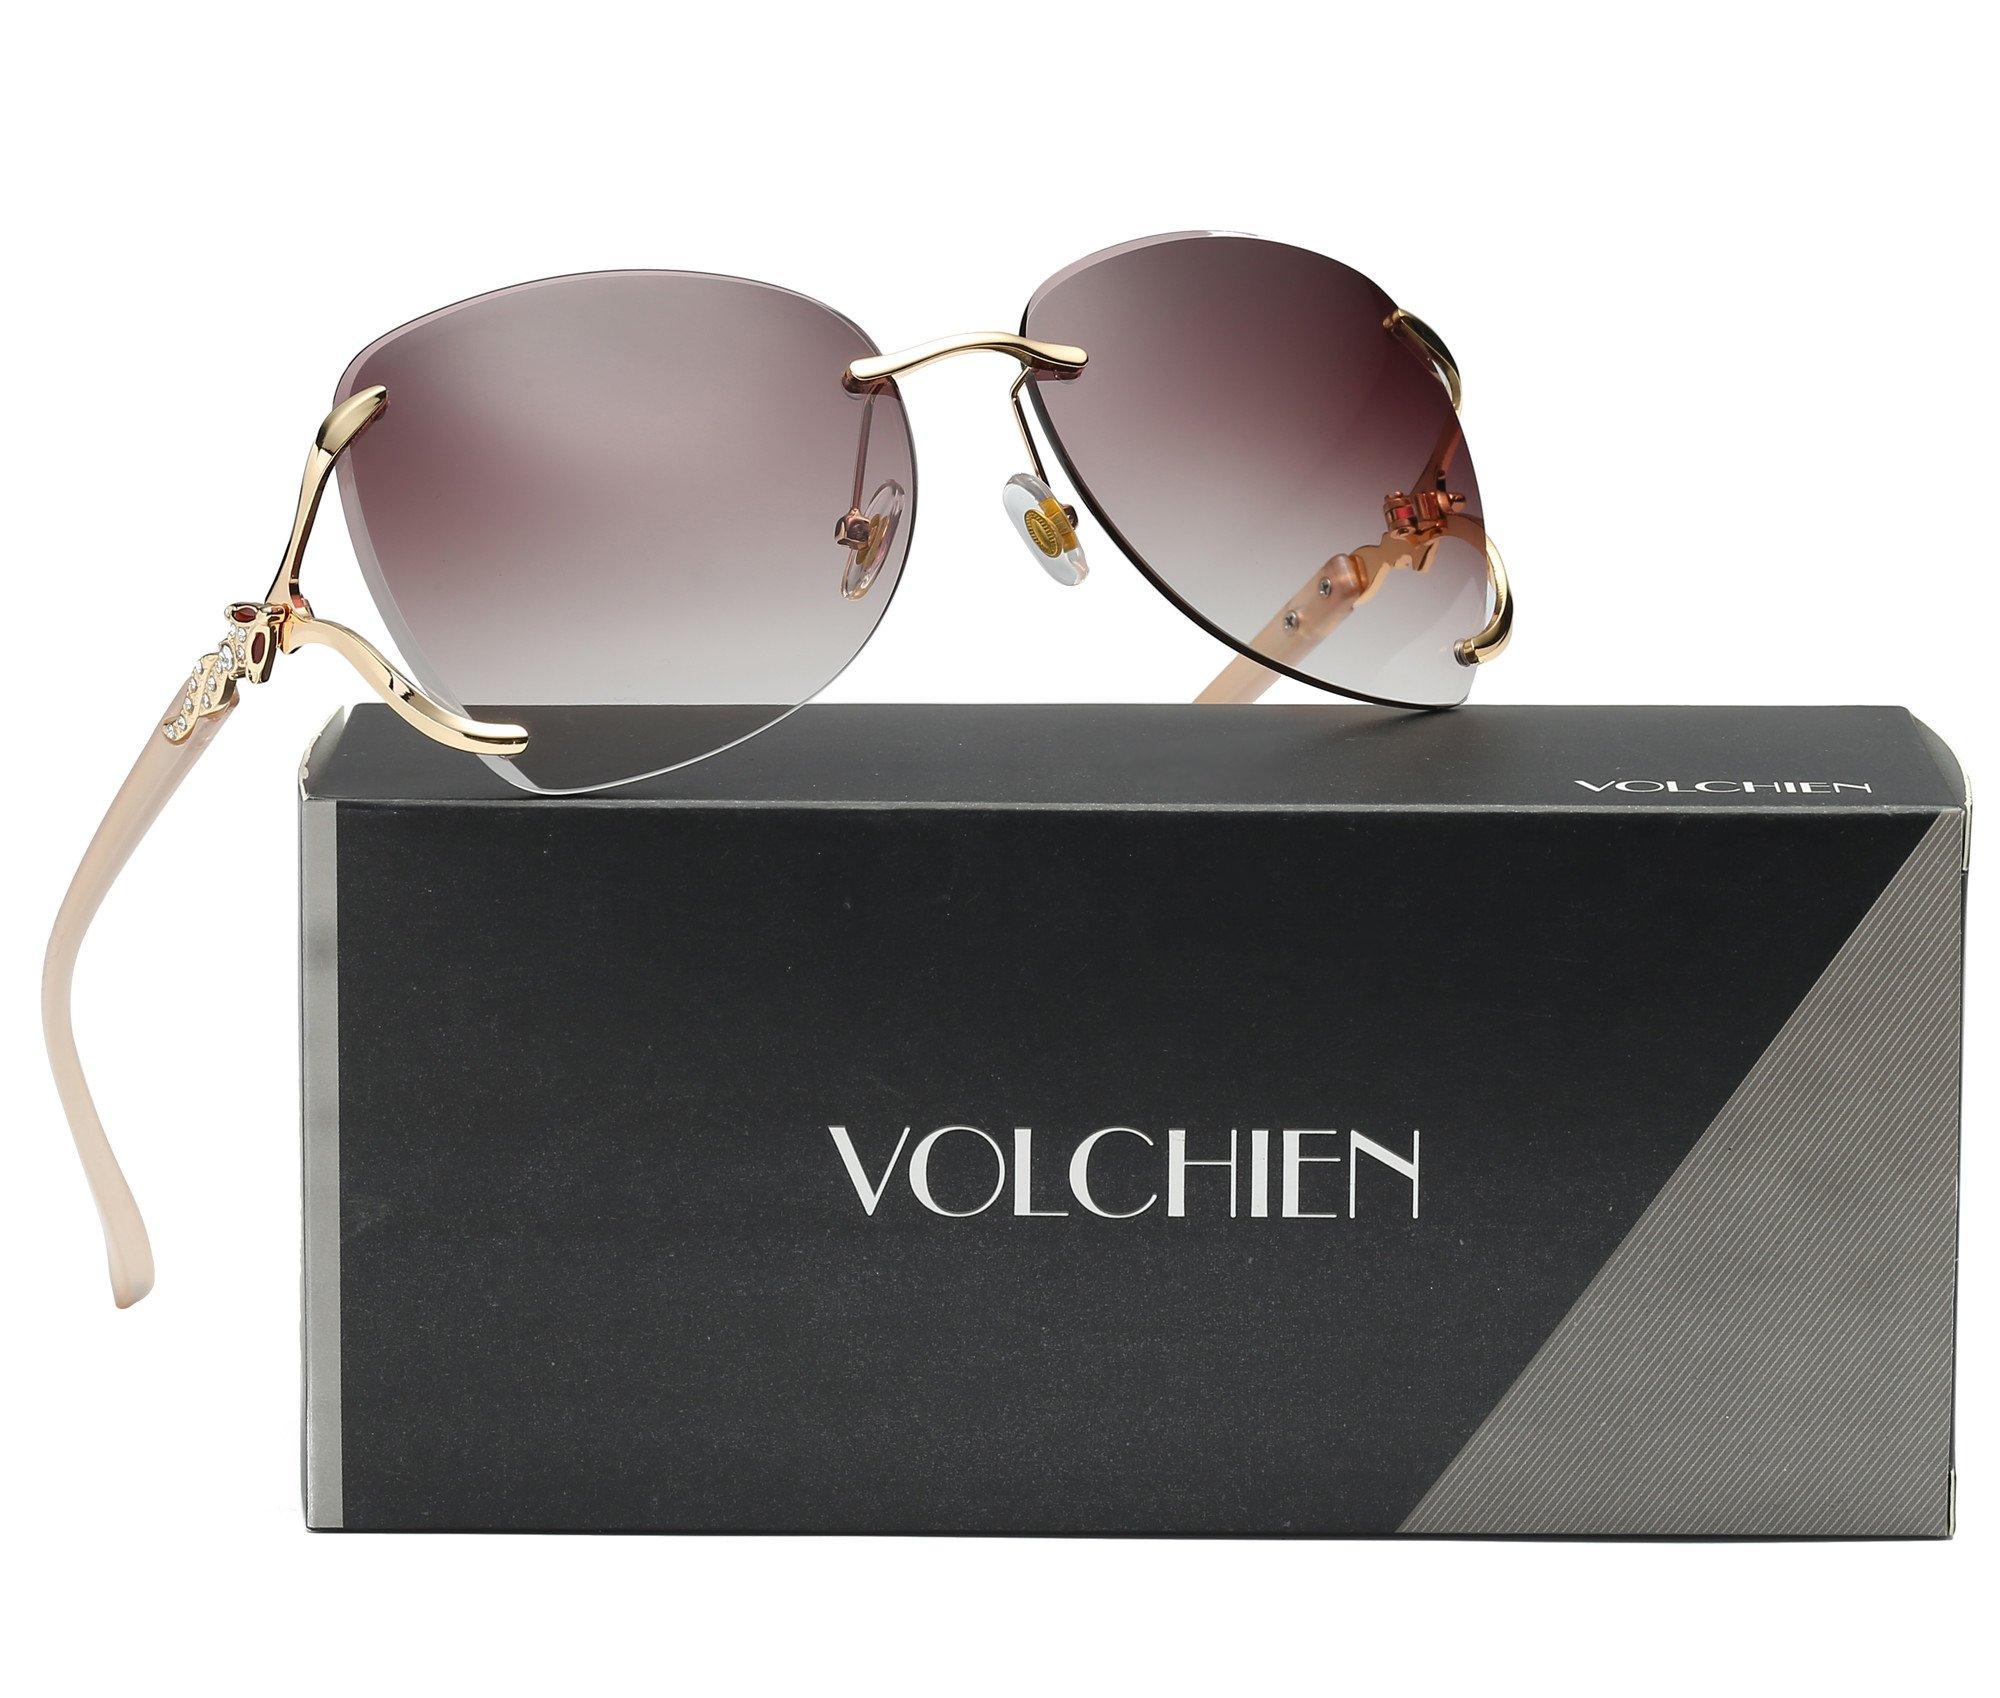 VOLCHIEN Rimless Women Shades Sunglasses Bling Frame Round Lens Sun Glass  Metal Frame Sunglasses for Women Men VC1012 (Coffee Lens Champagne Arm) 36acd9e8bf